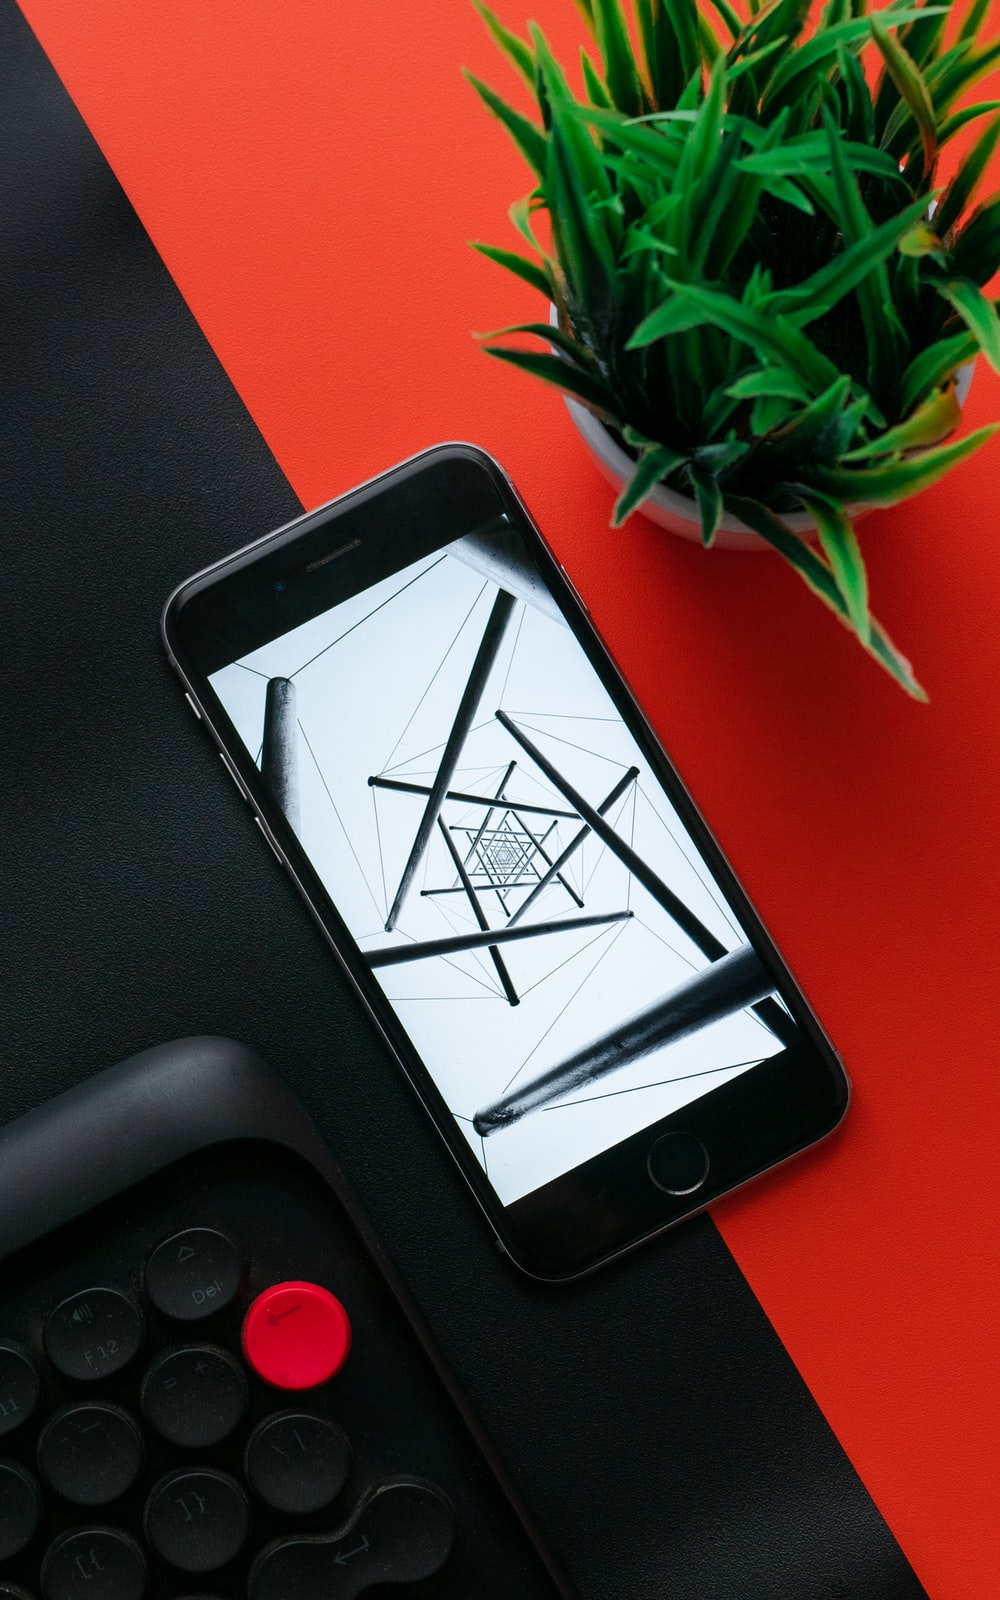 black iphone 5 on black textile